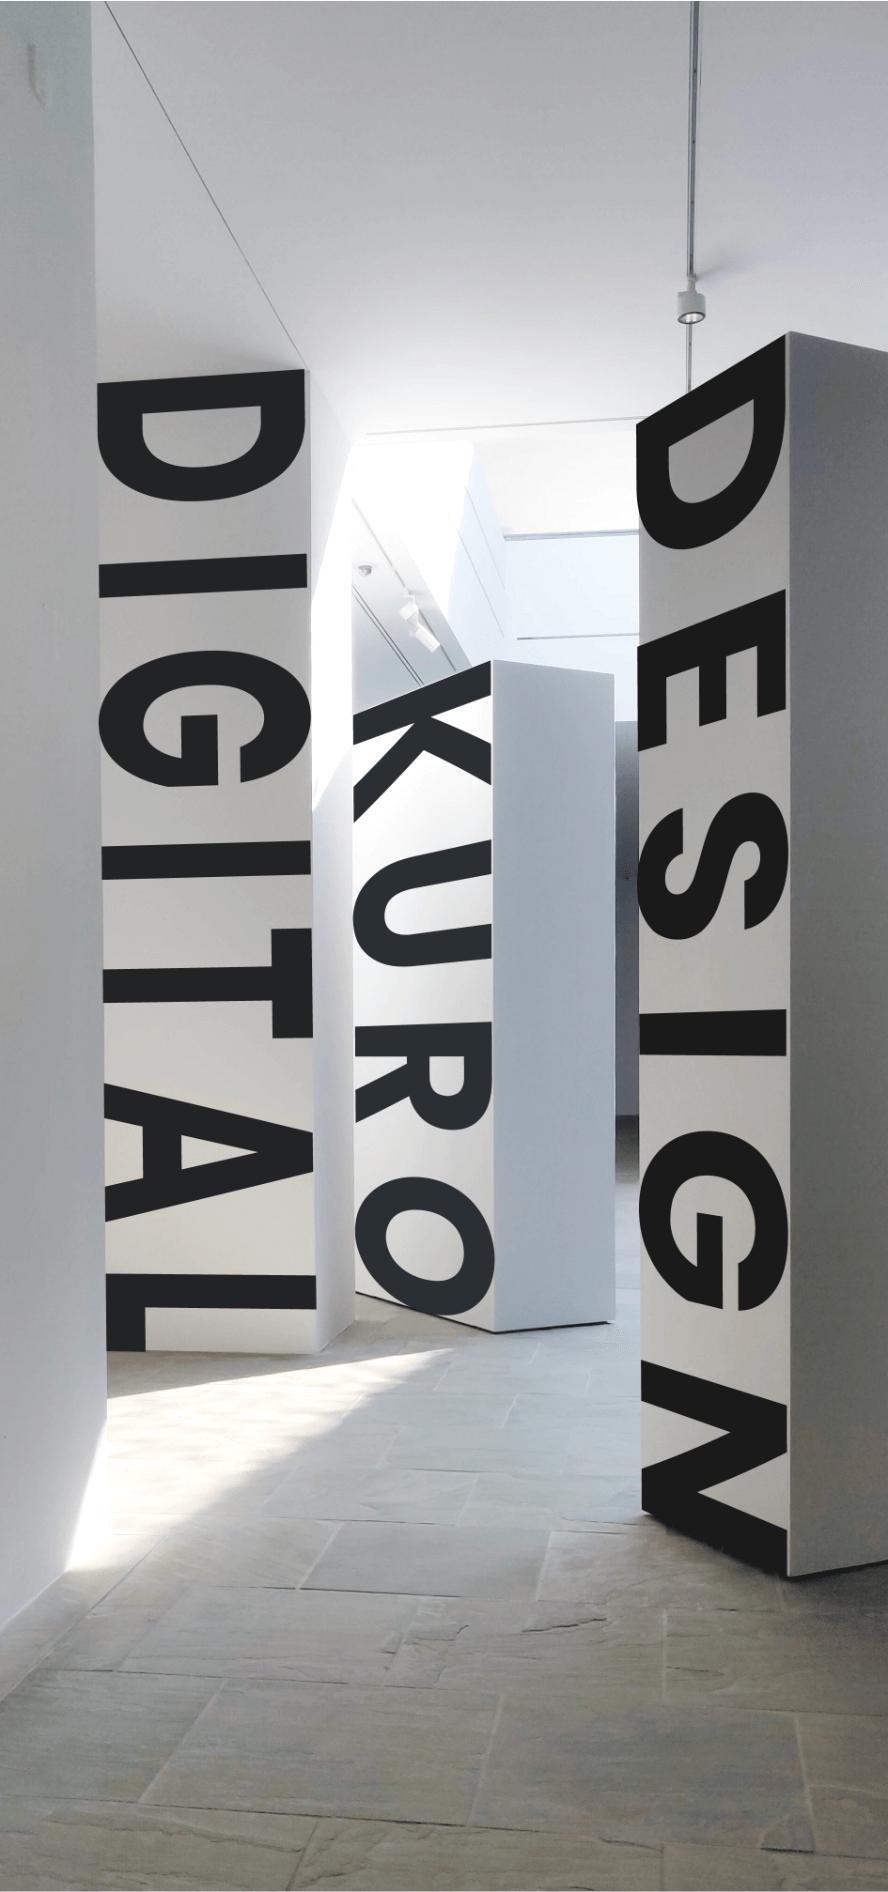 Digital Design Kuro